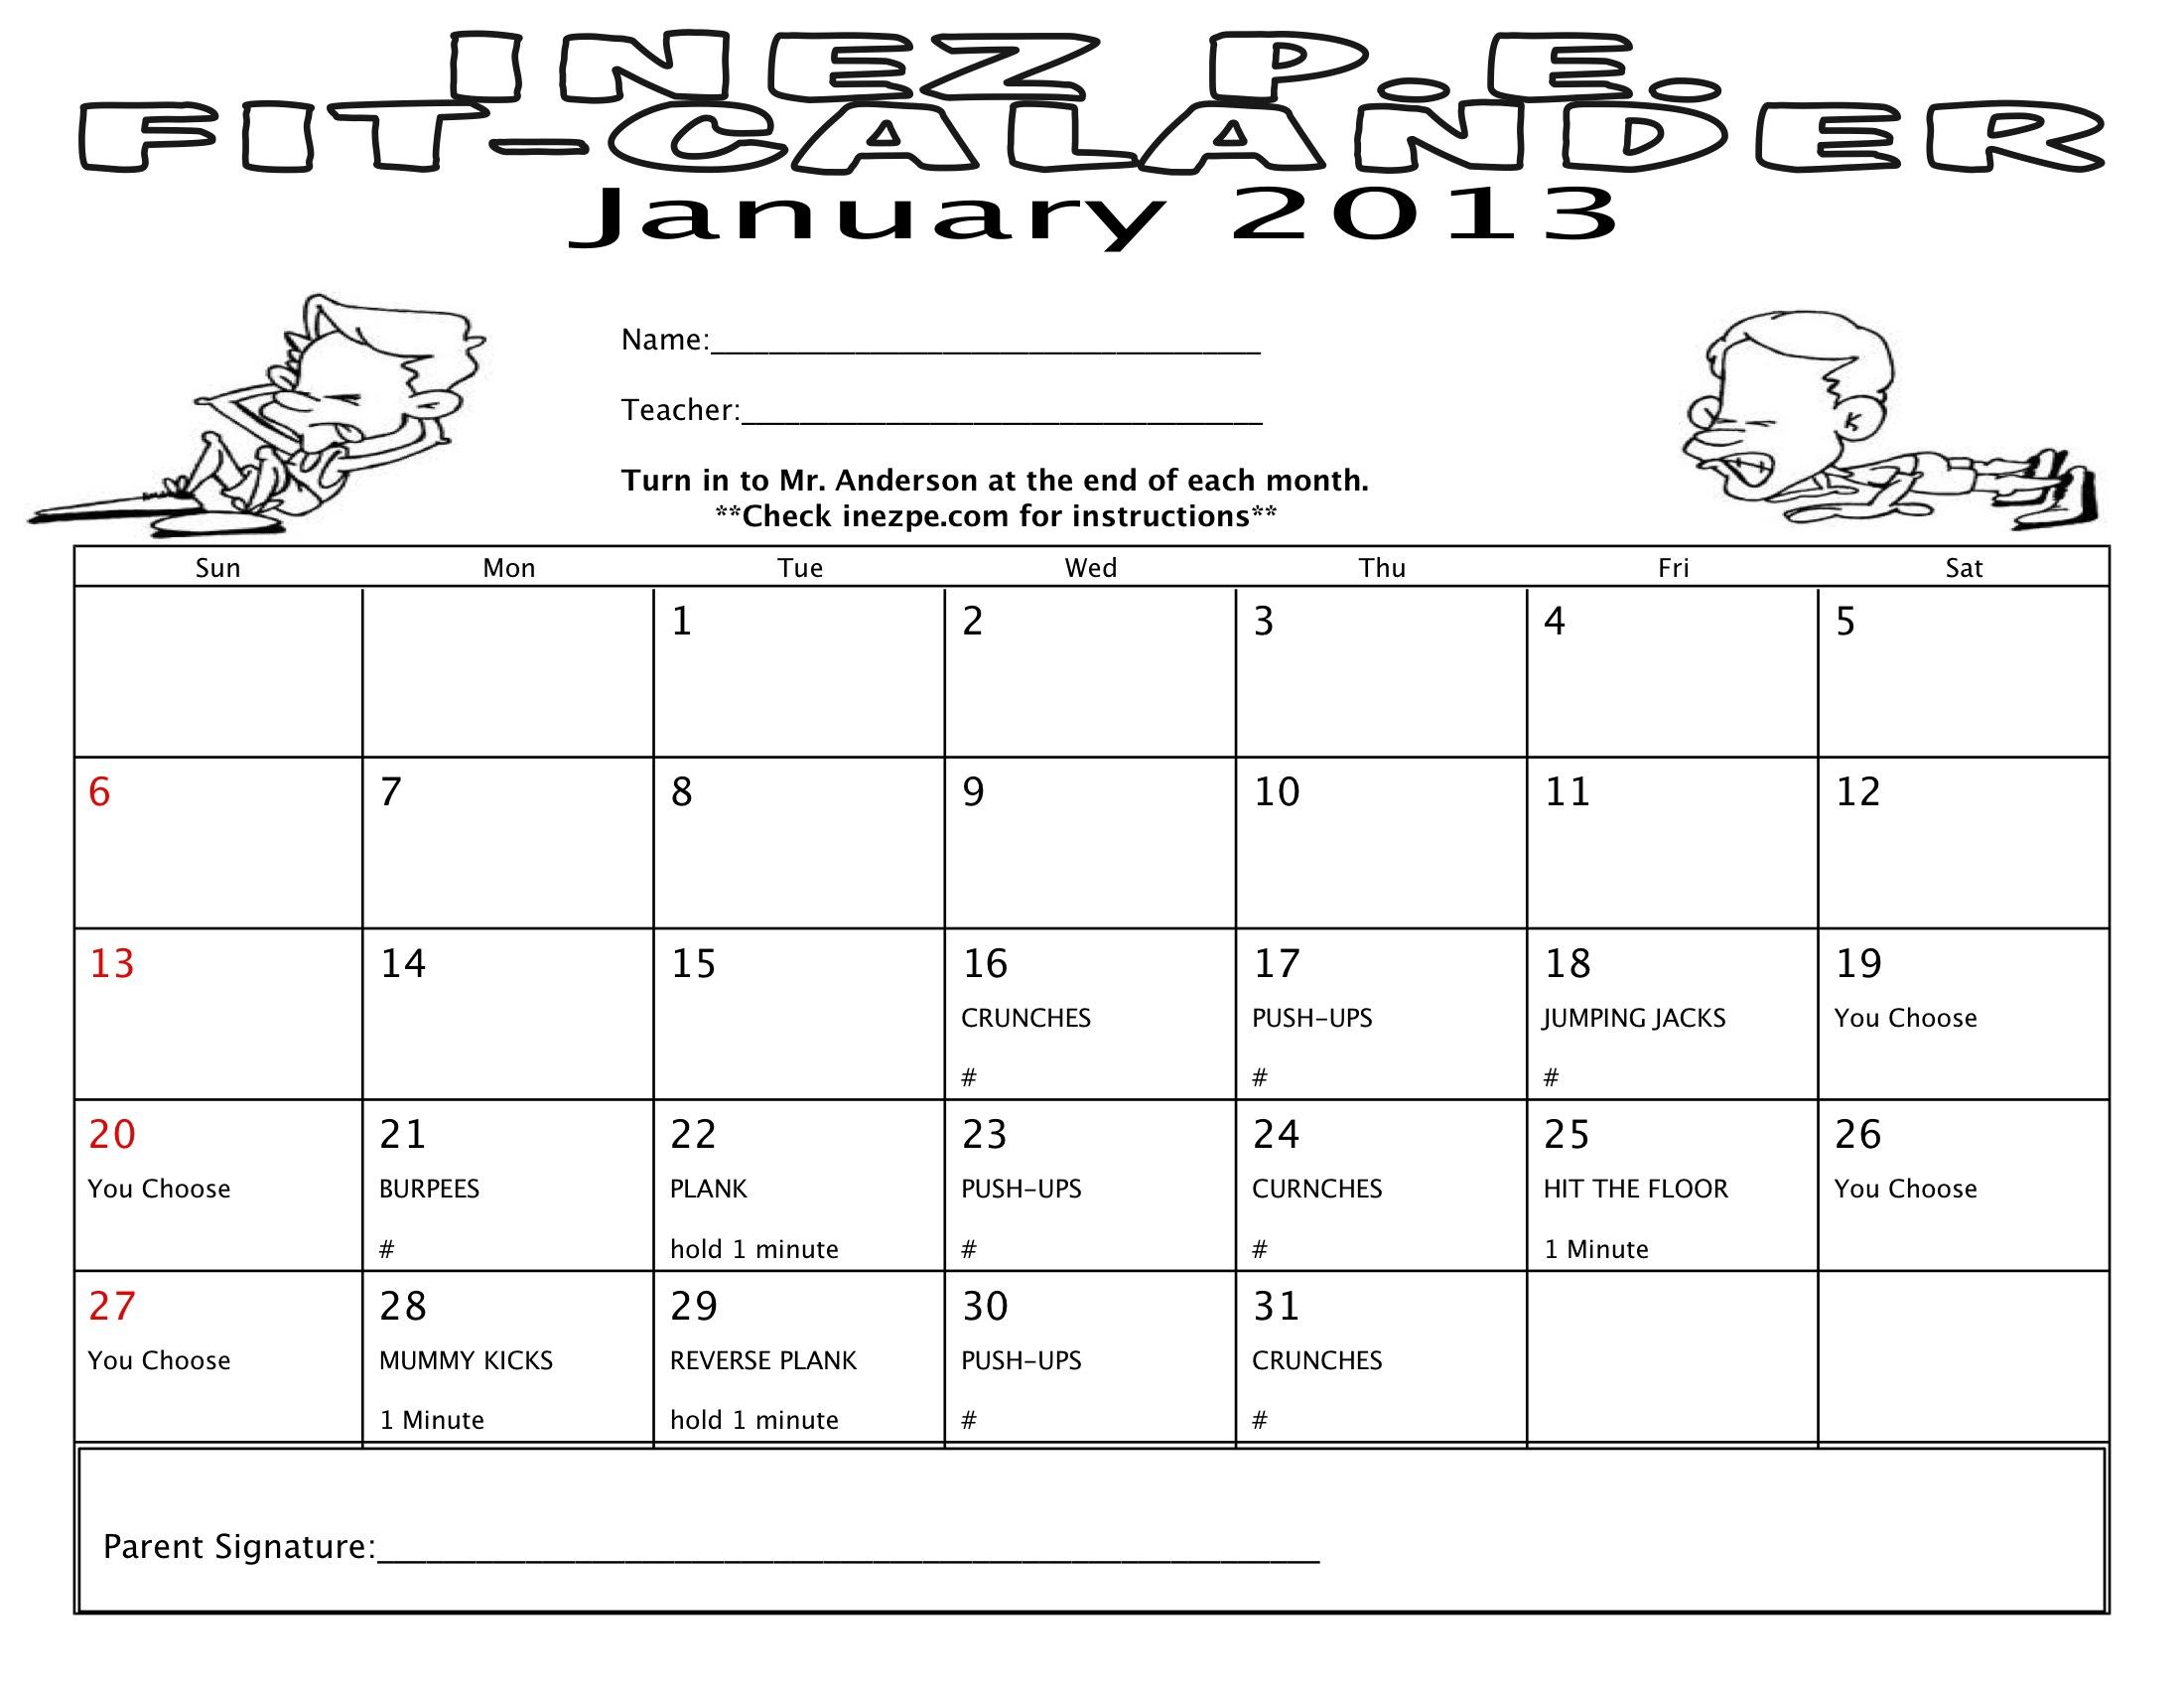 workout record sheet